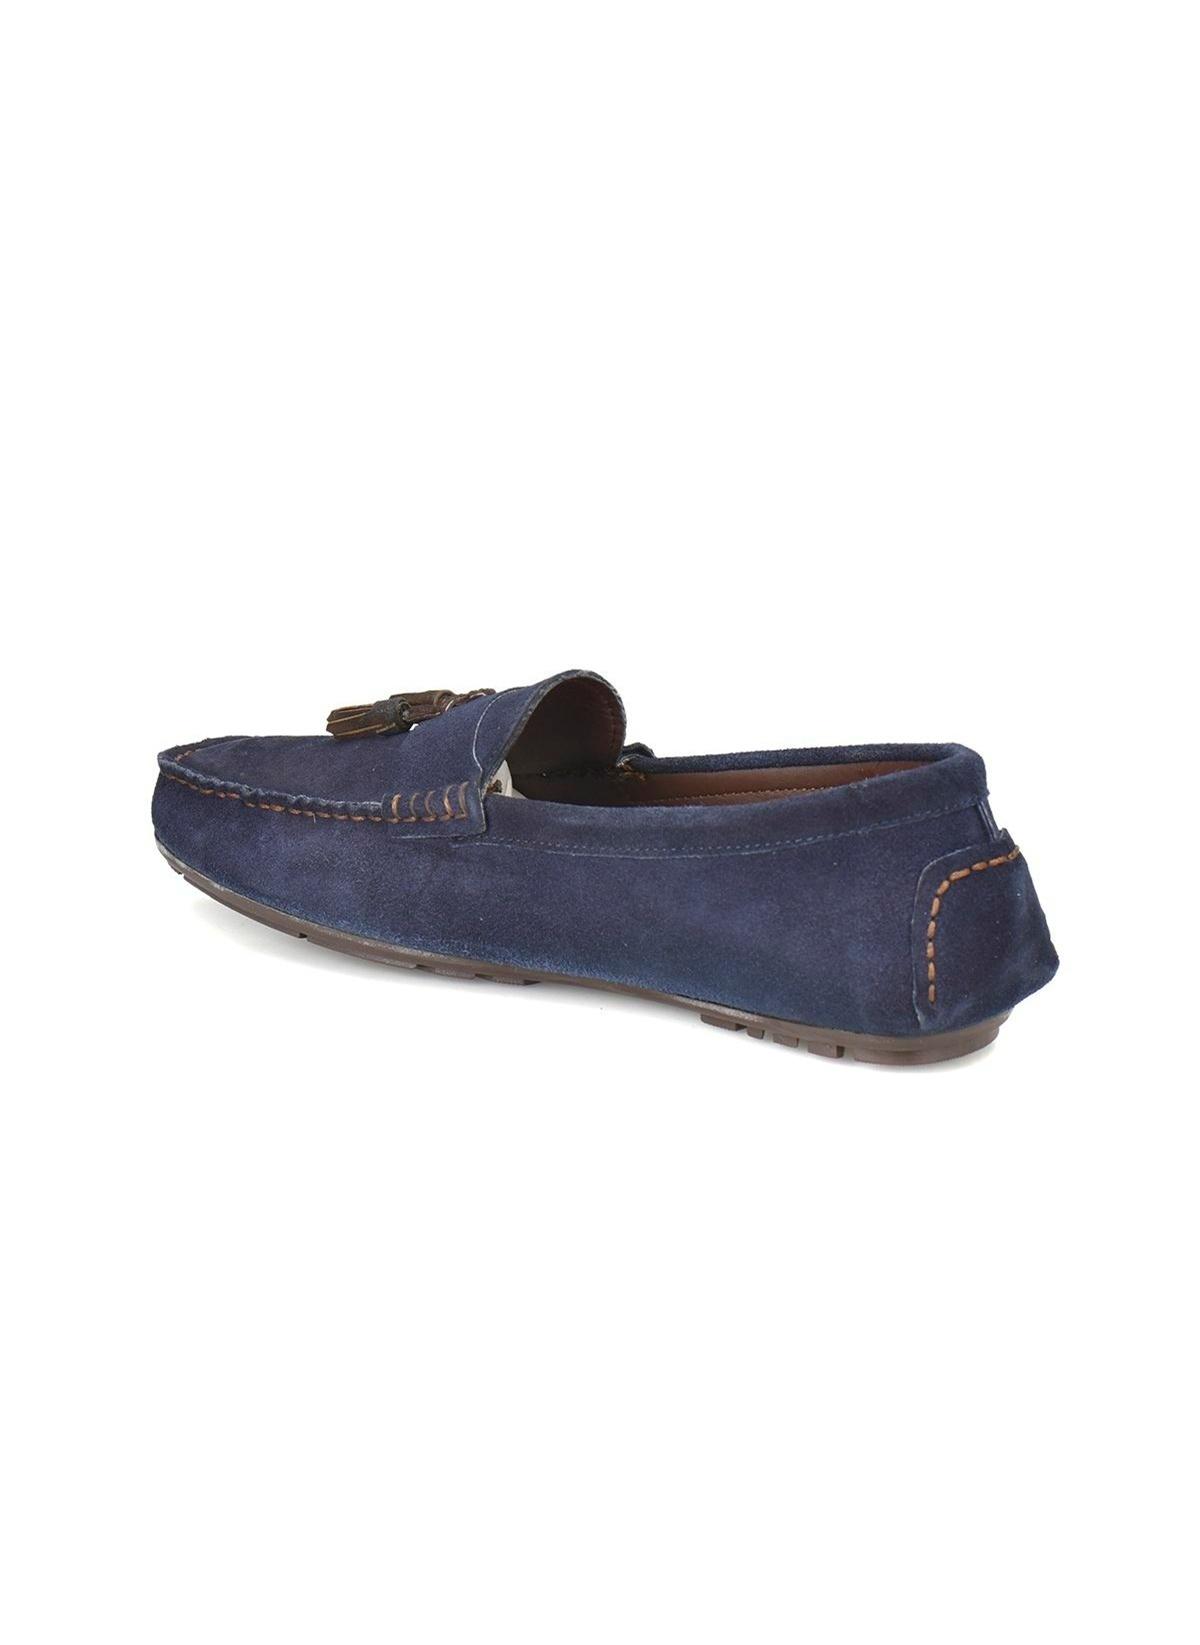 254201706eb4a Oxide Ayakkabı Lacivert; Oxide Ayakkabı Lacivert; Oxide Ayakkabı Lacivert